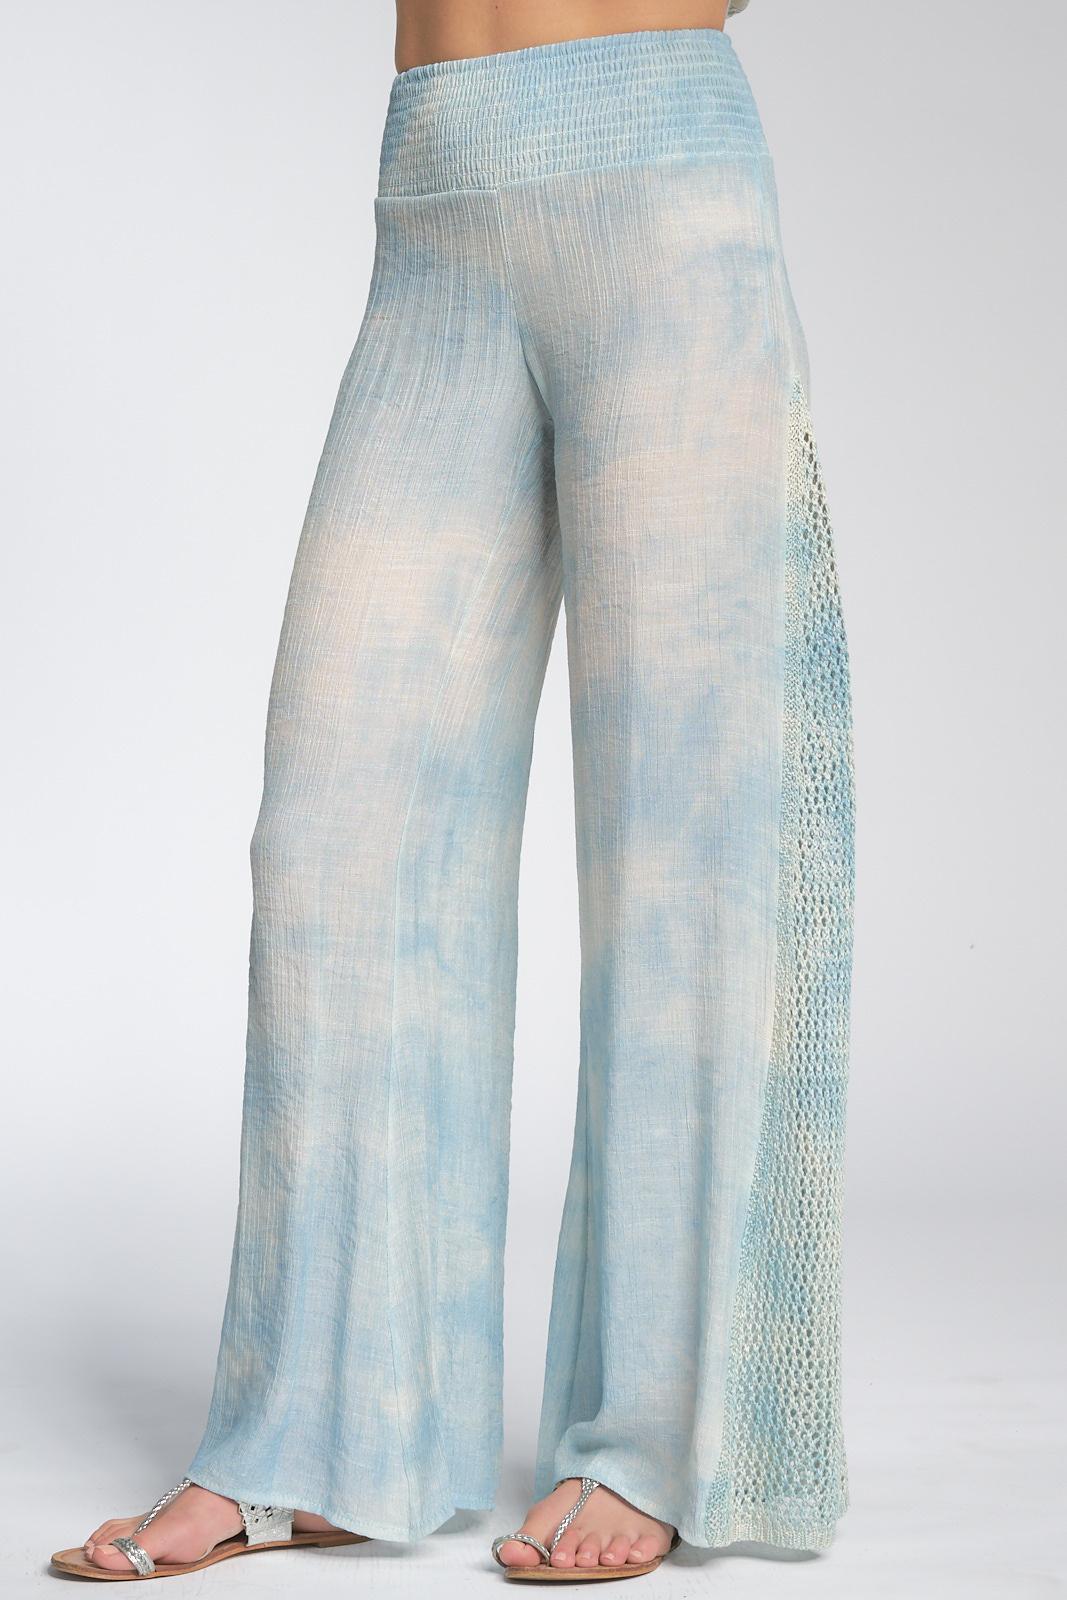 Havana Tie-Dye Pants